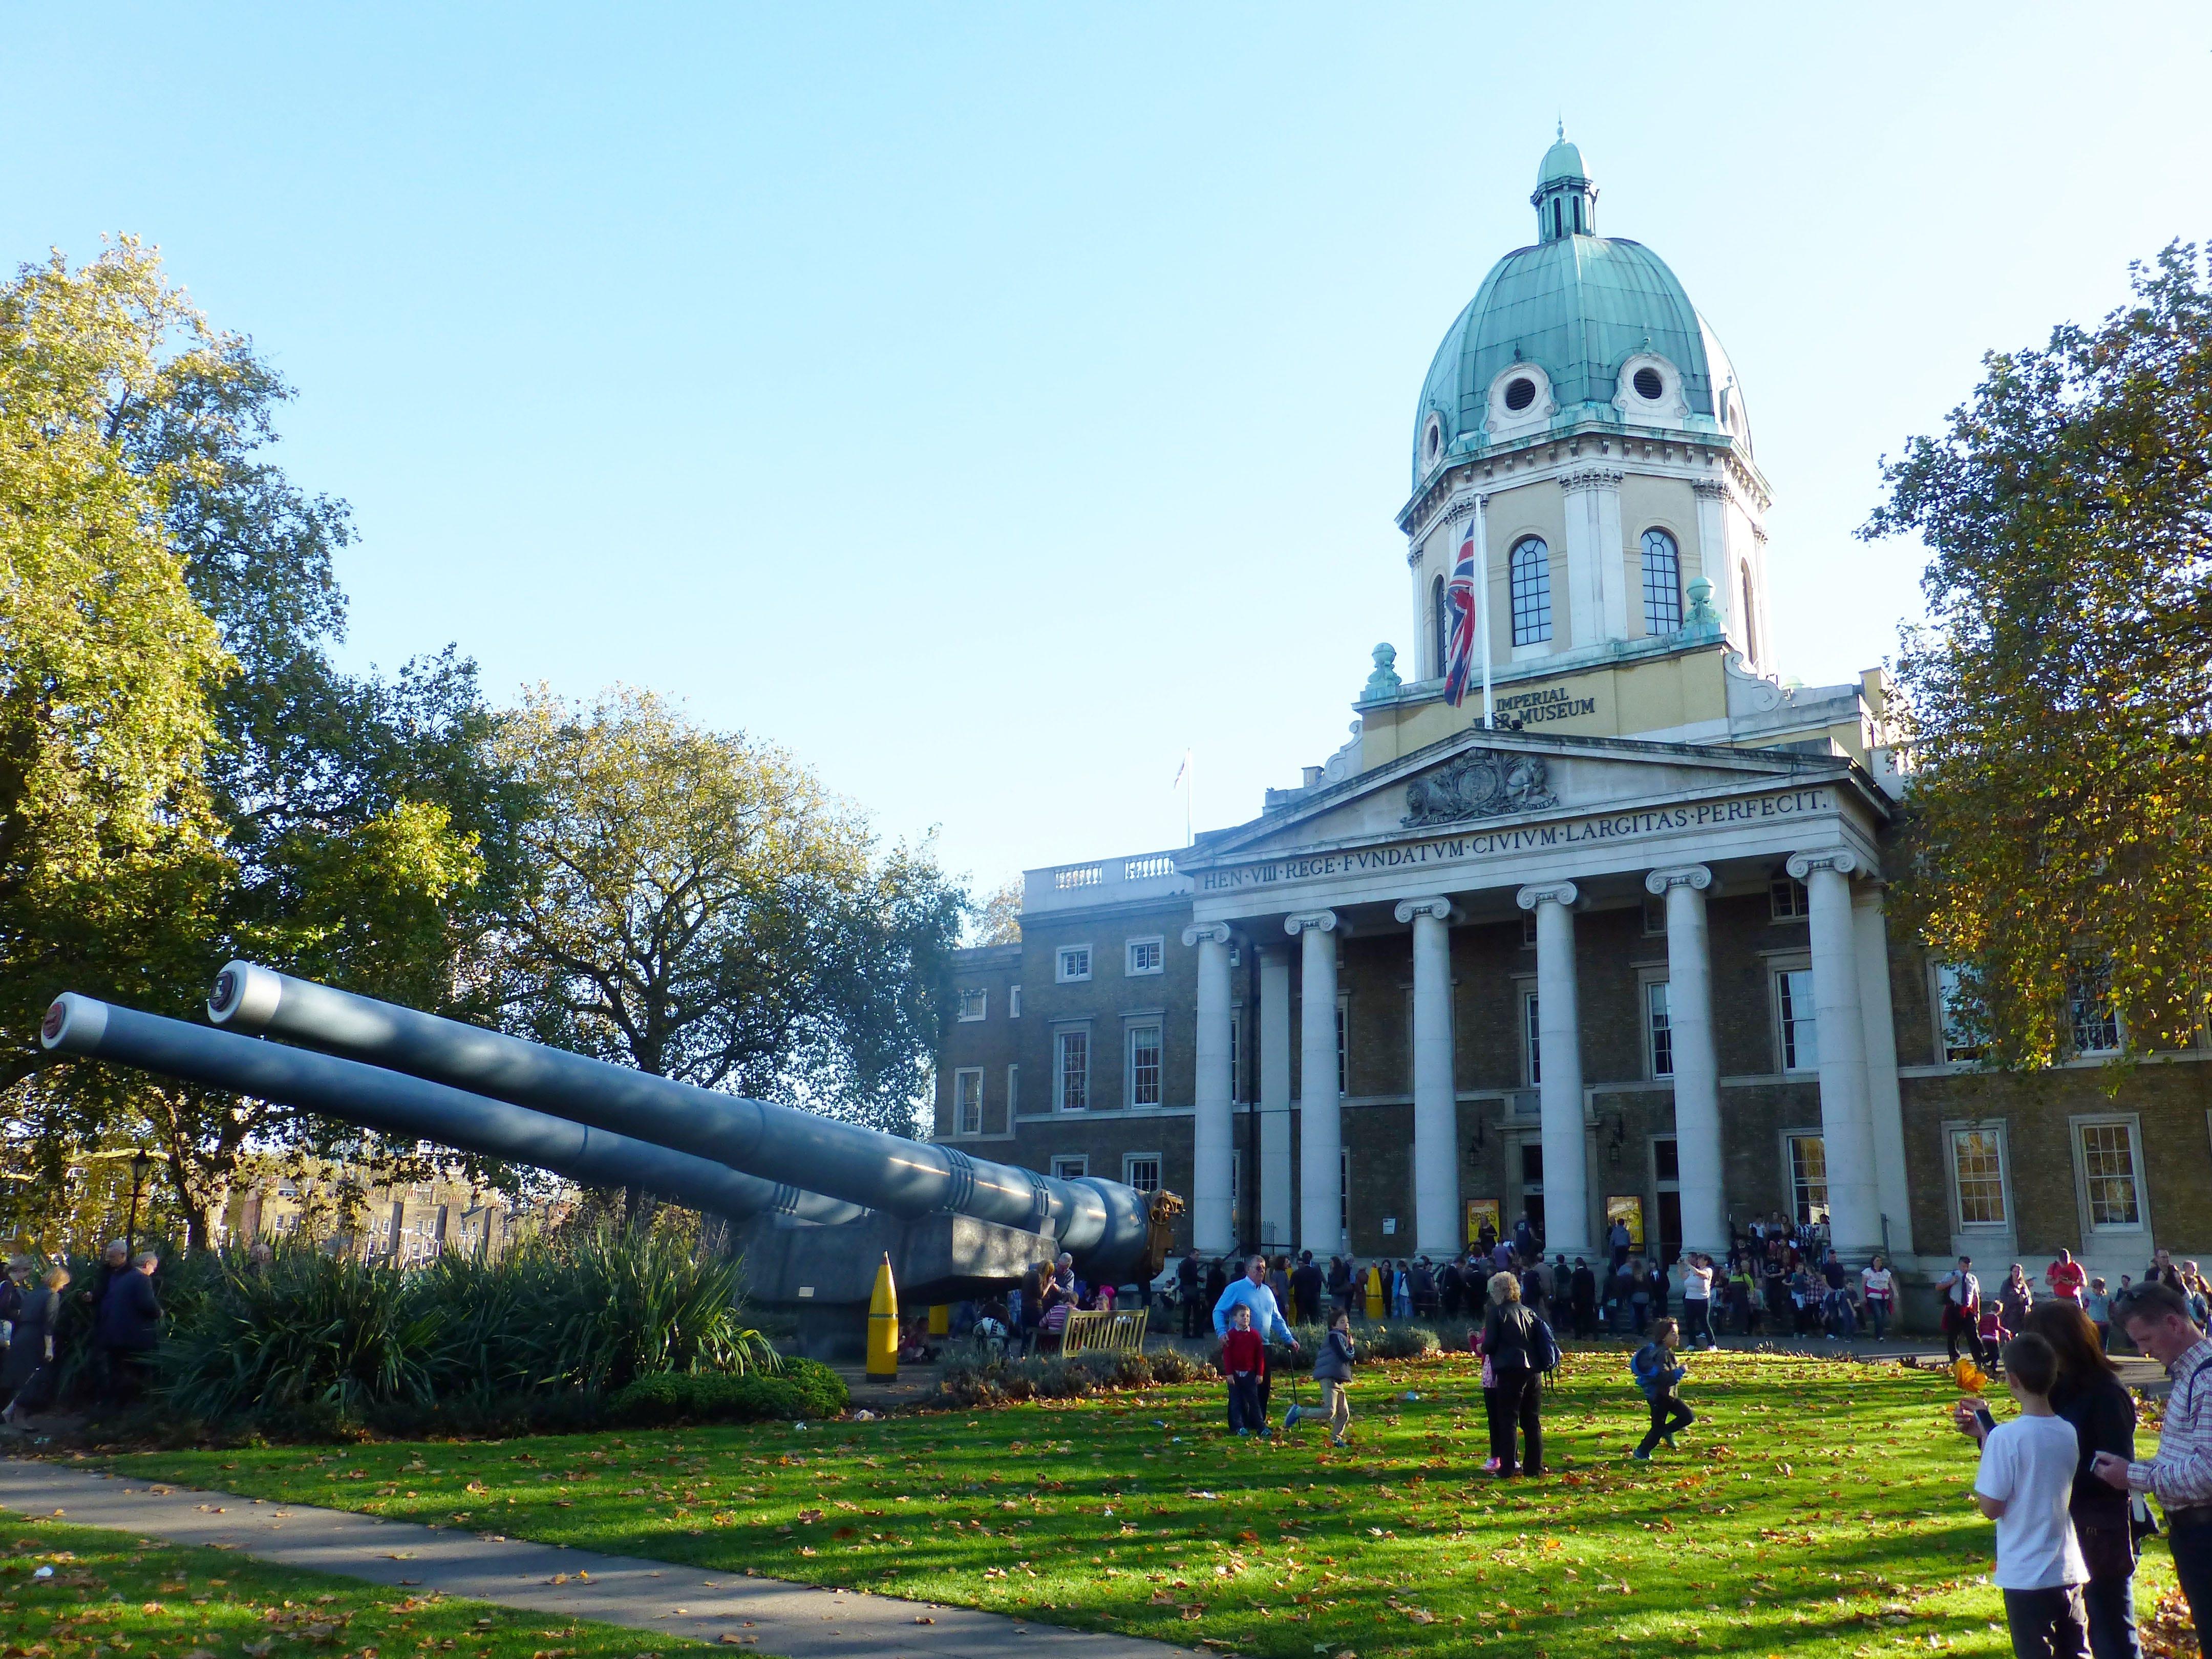 imperial war museum facade